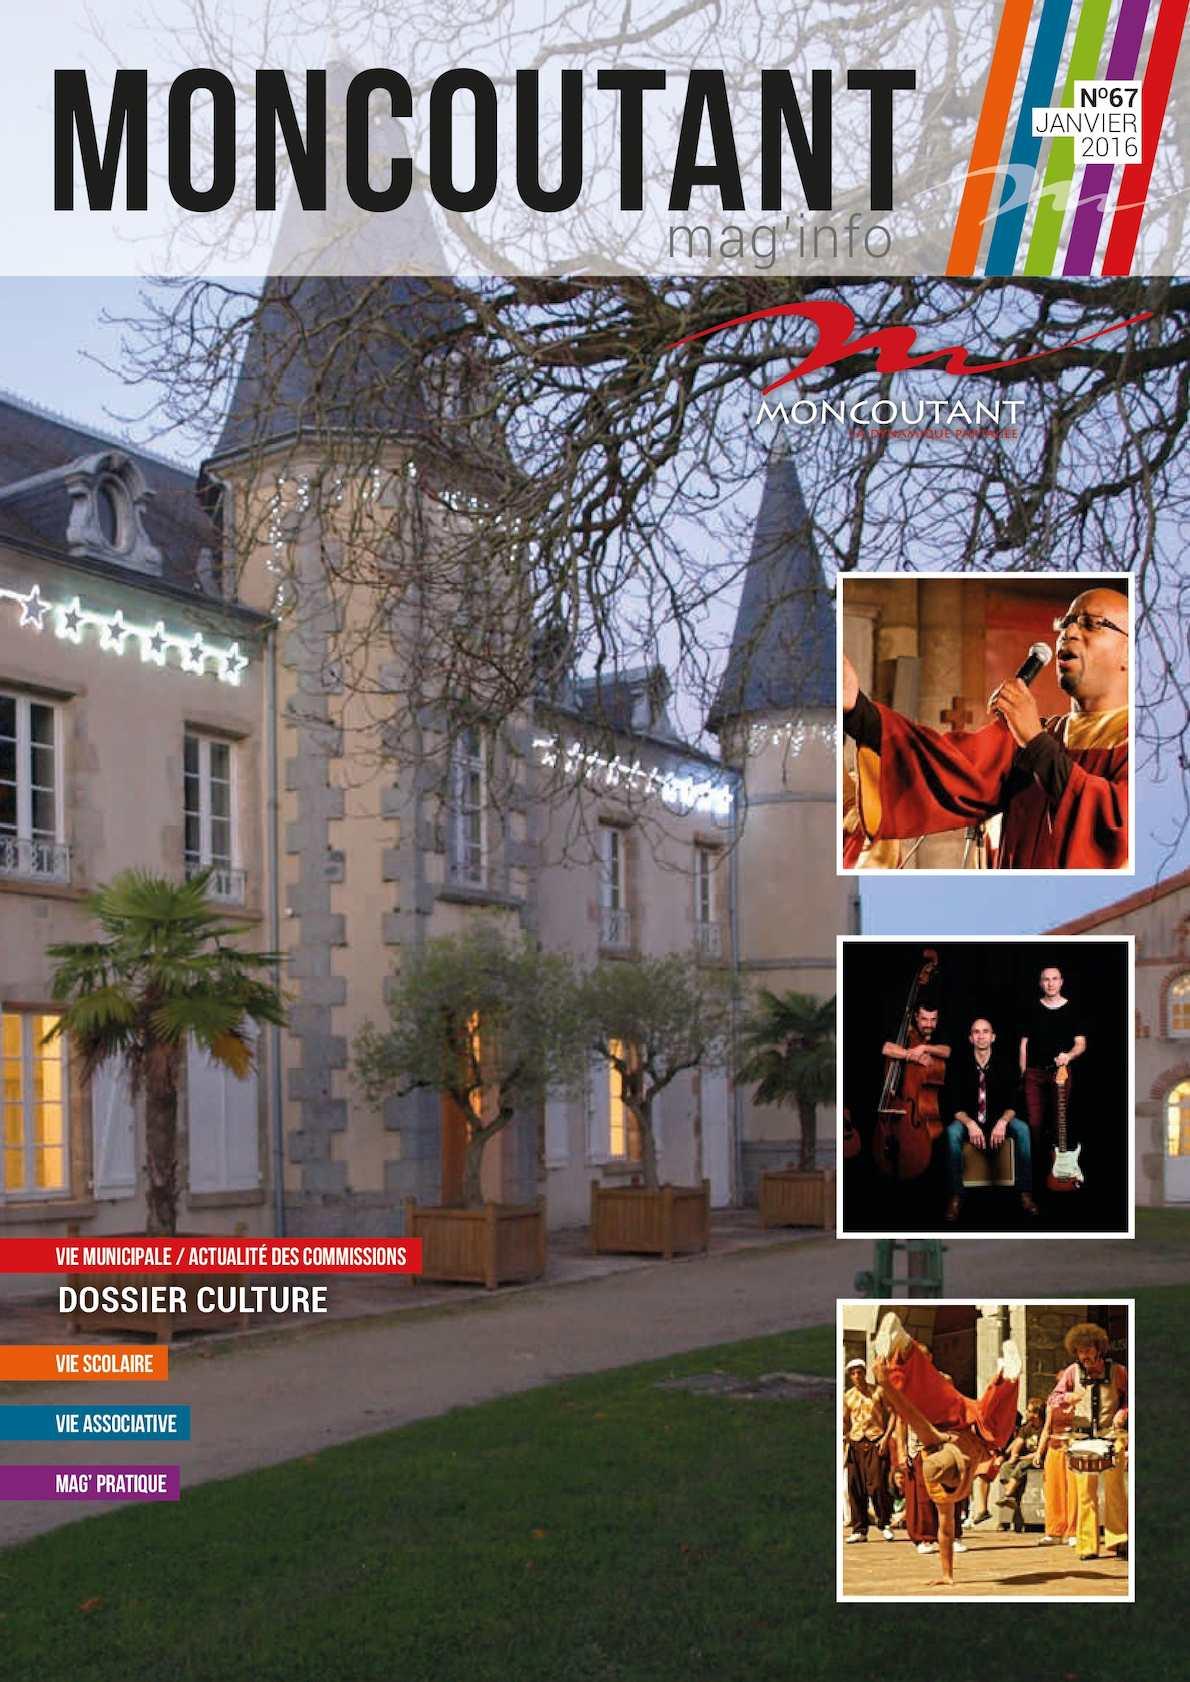 De Bulletin Municipal N°67 Calaméo Moncoutant Mairie 5jL34ARq